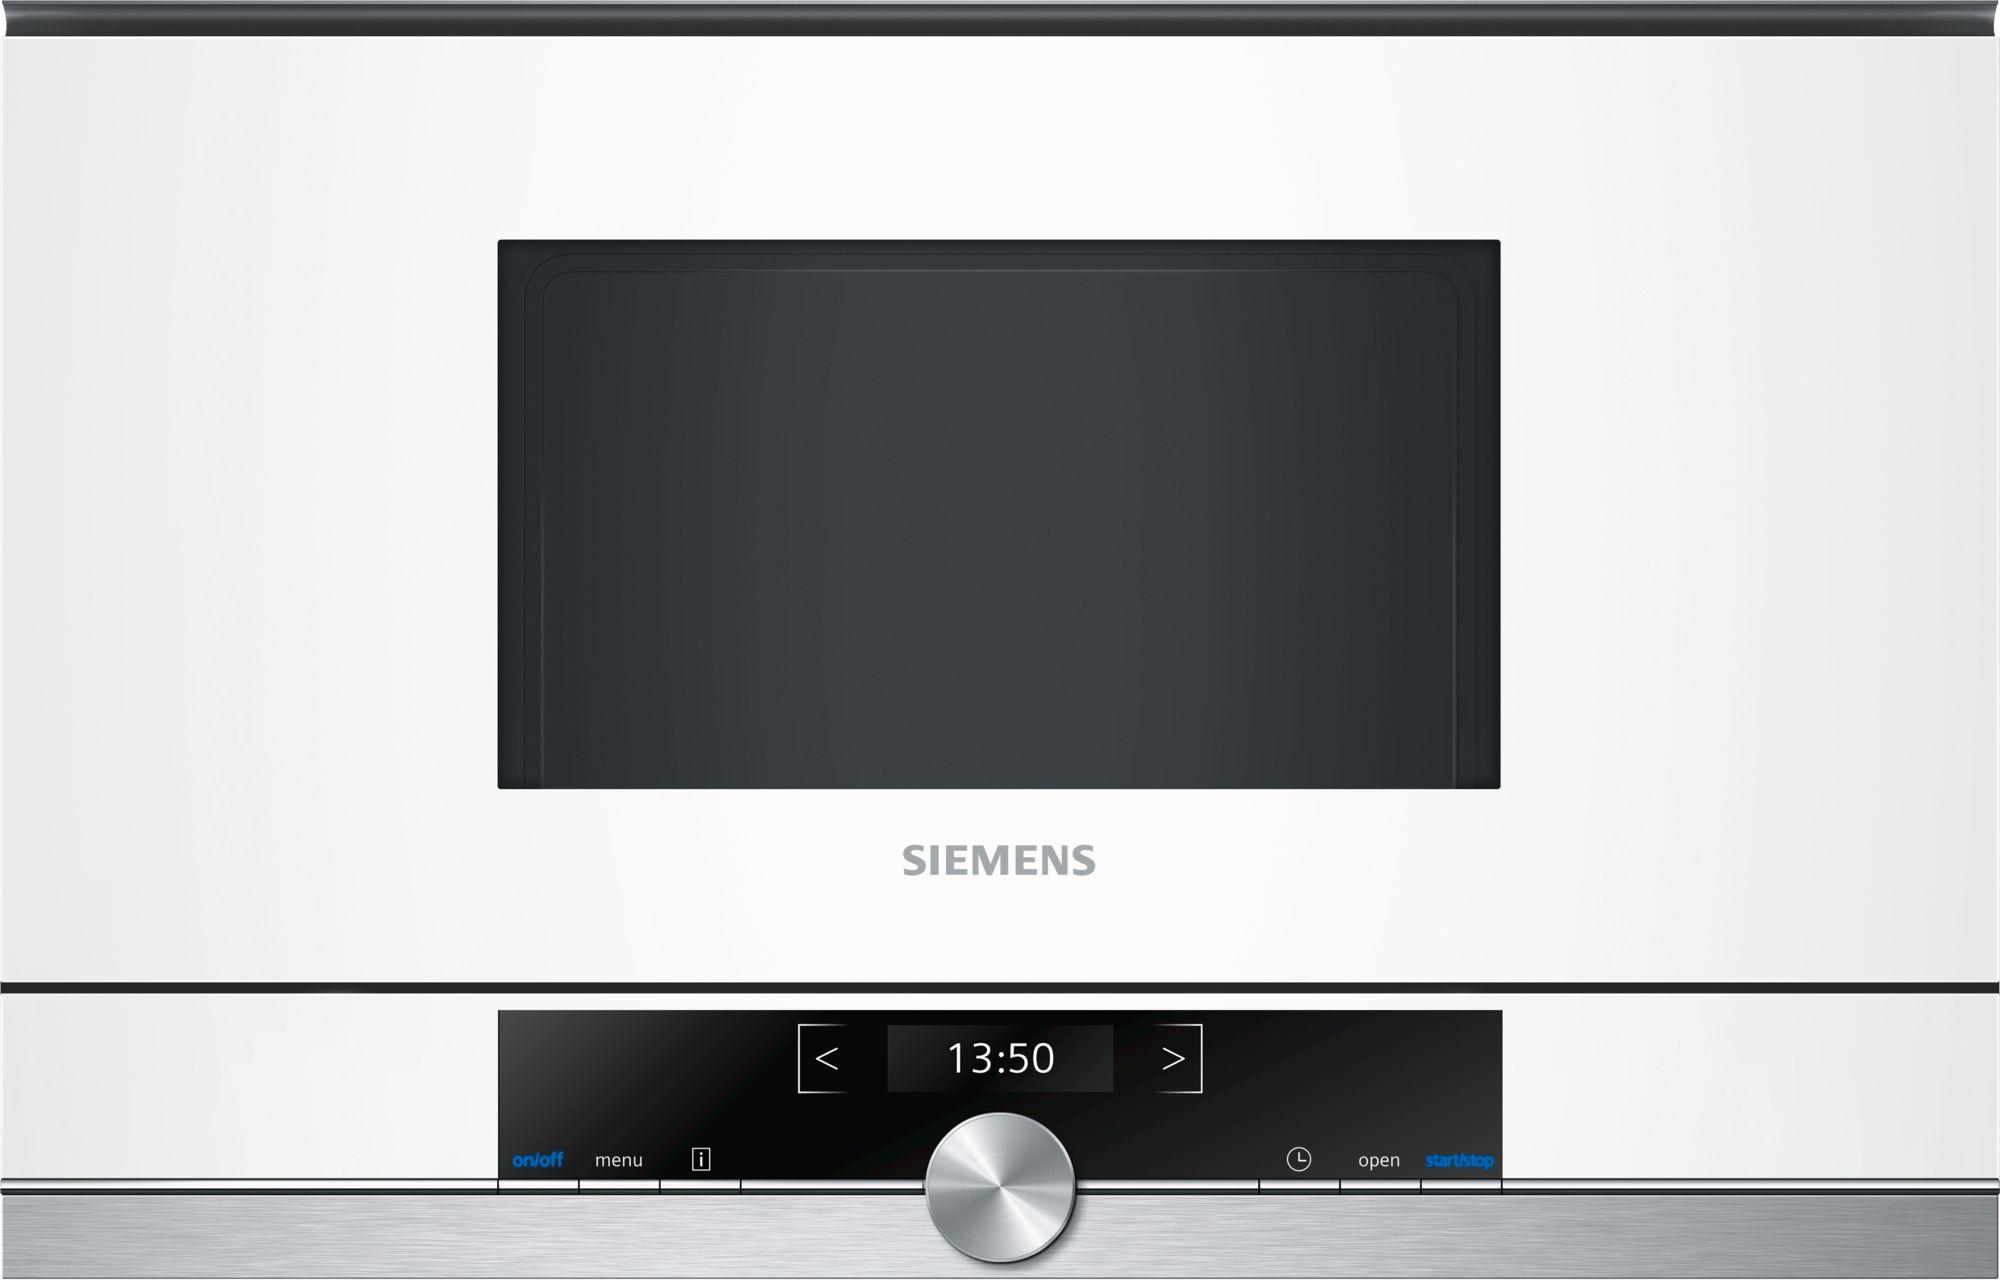 Siemens BF634LGW1 Einbau-Mikrowelle Weiß